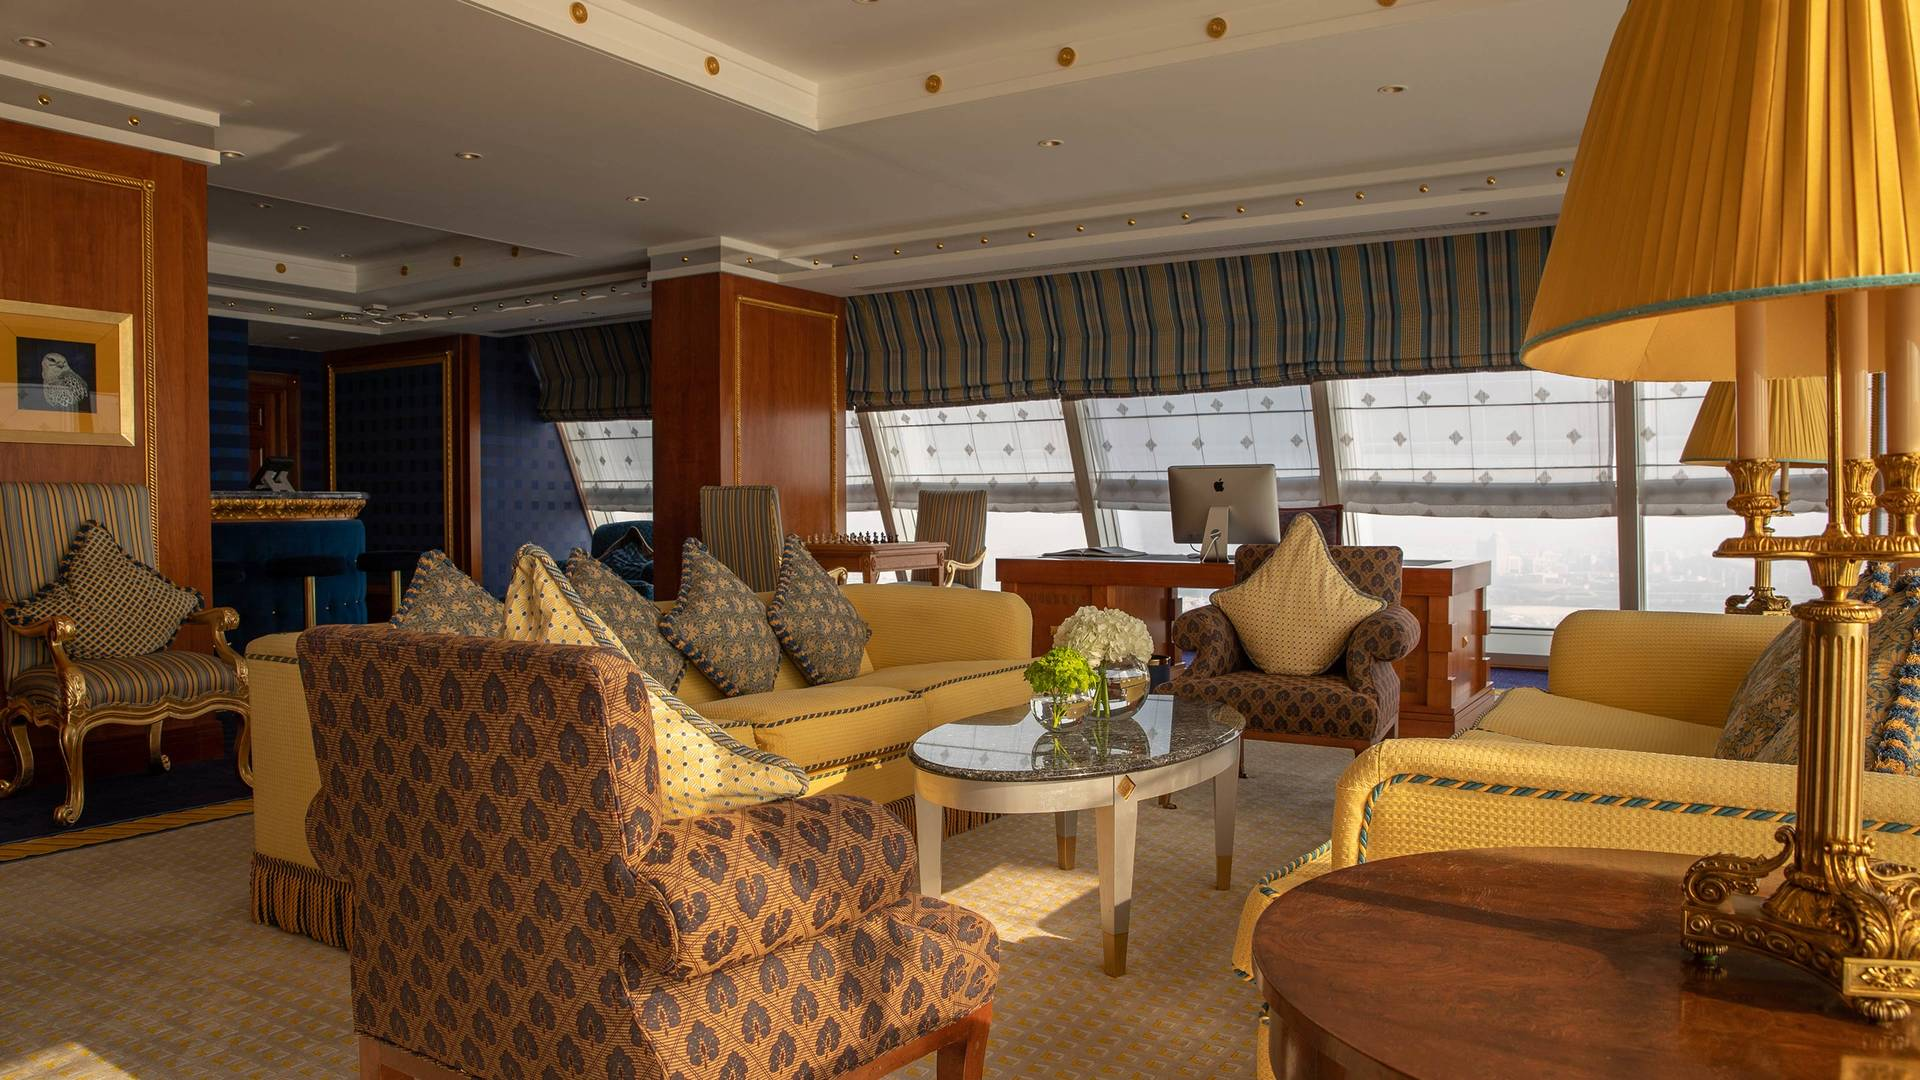 Jumeirah Burj Al Arab Presidential suite living room_16-9